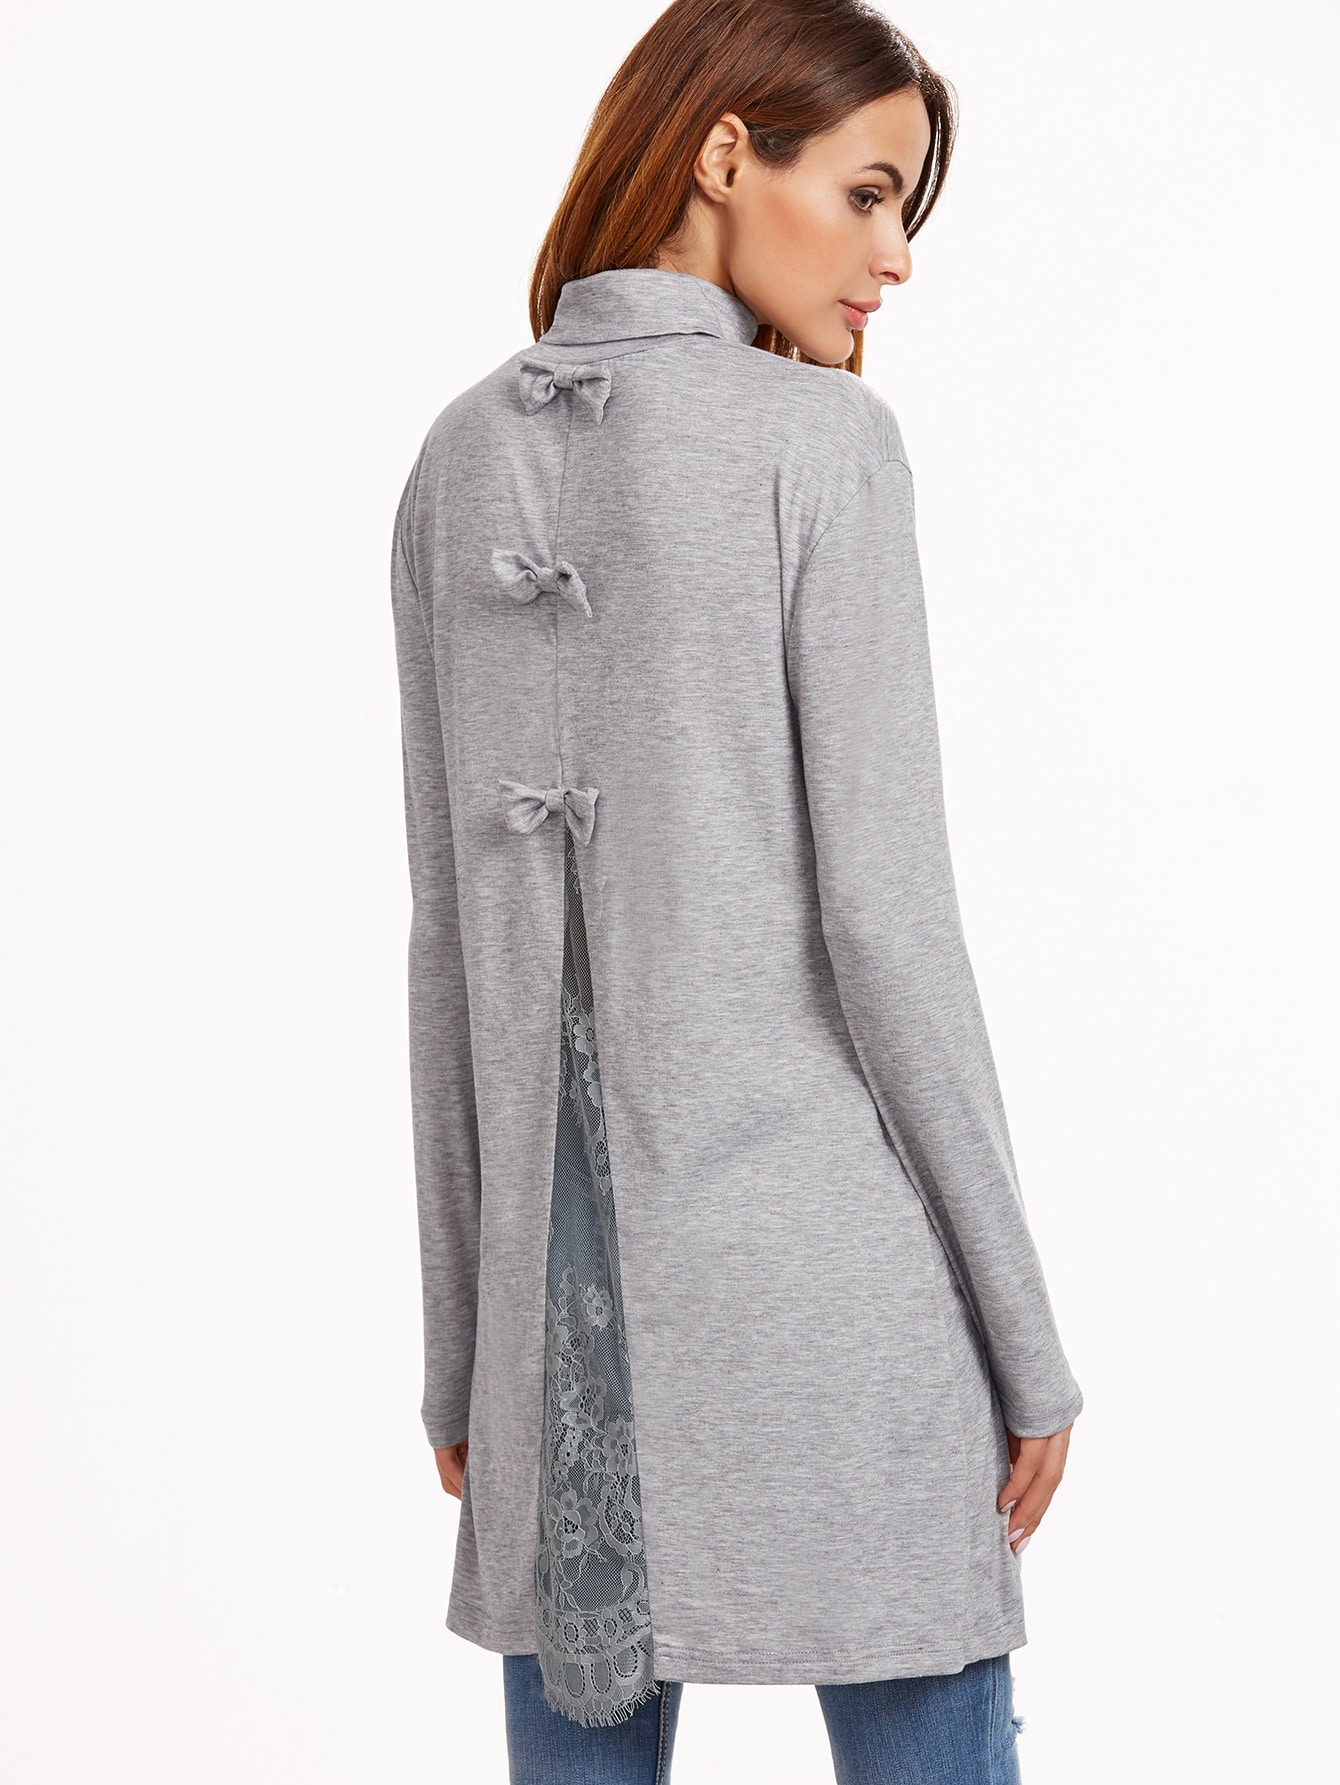 Heather Grey Bow Embellished Lace Insert Split Back T-shirtHeather Grey Bow Embellished Lace Insert Split Back T-shirt<br><br>color: Grey<br>size: L,M,S,XS